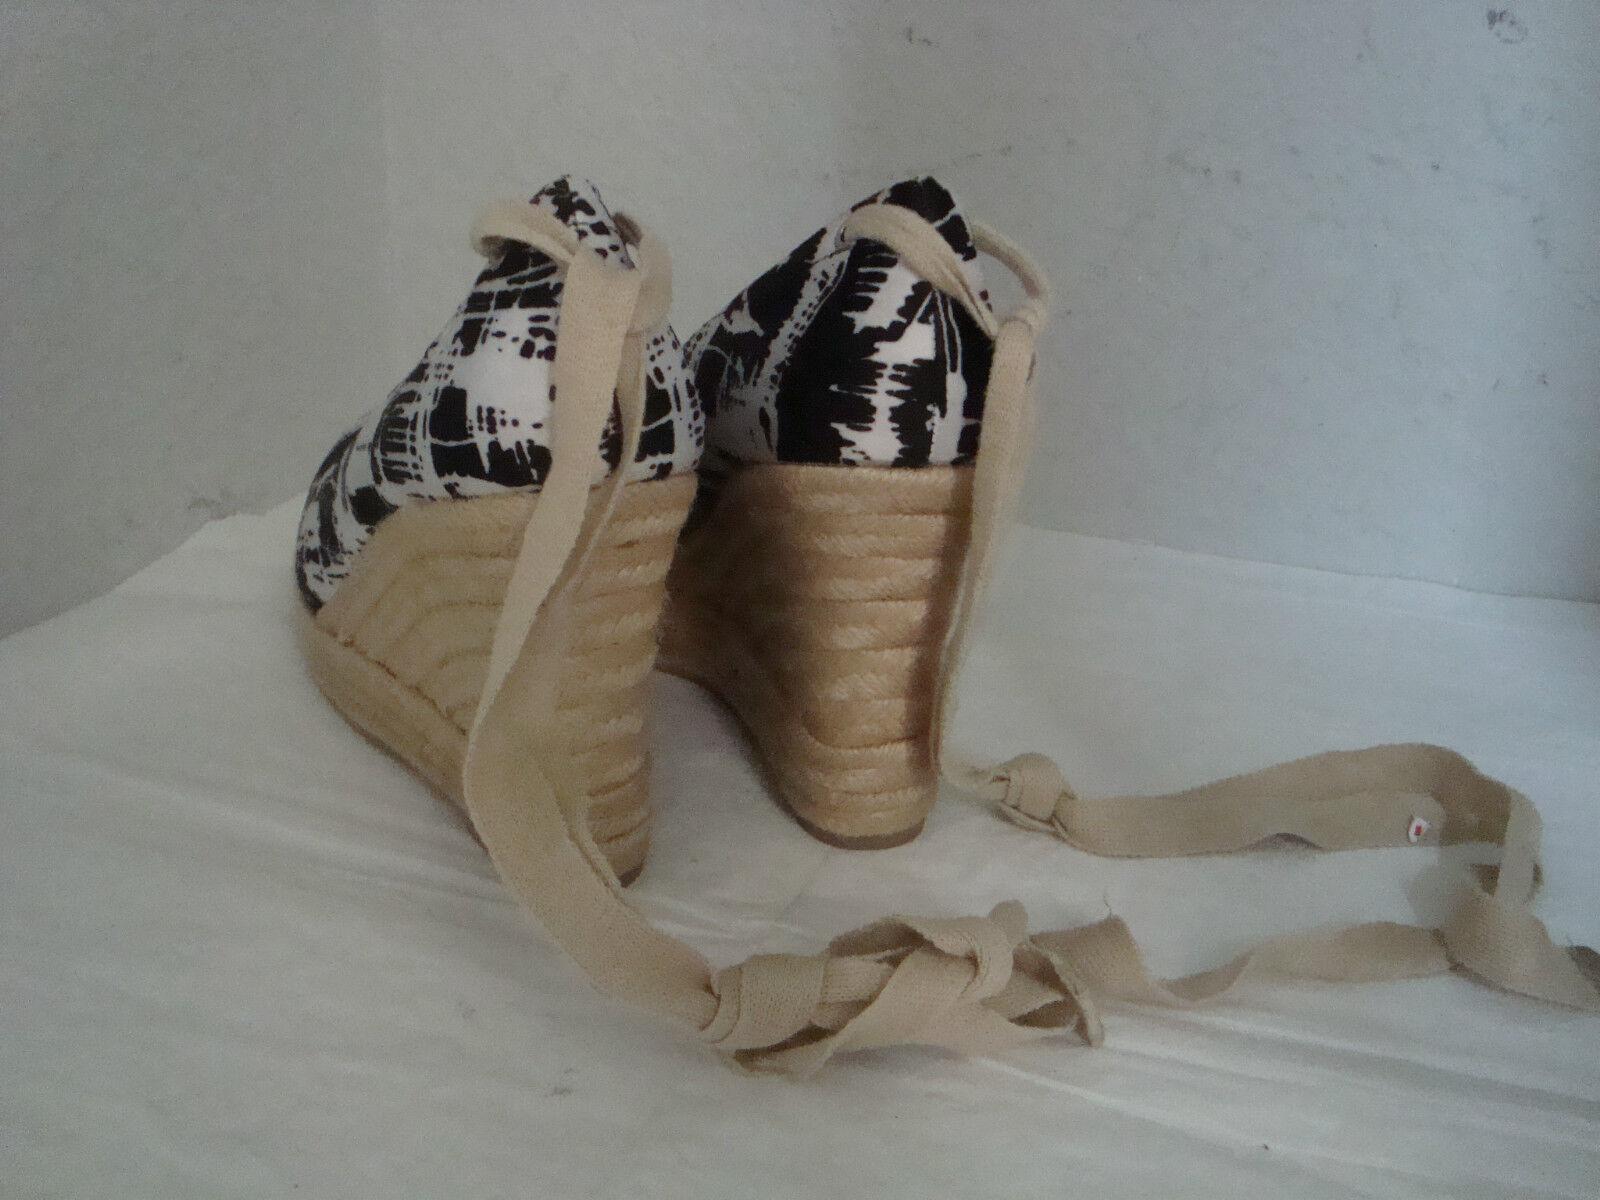 New Boutique 9 Btmarcello Btmarcello Btmarcello Black White Fabric Pint Wedge shoes 9 Medium c0d88e